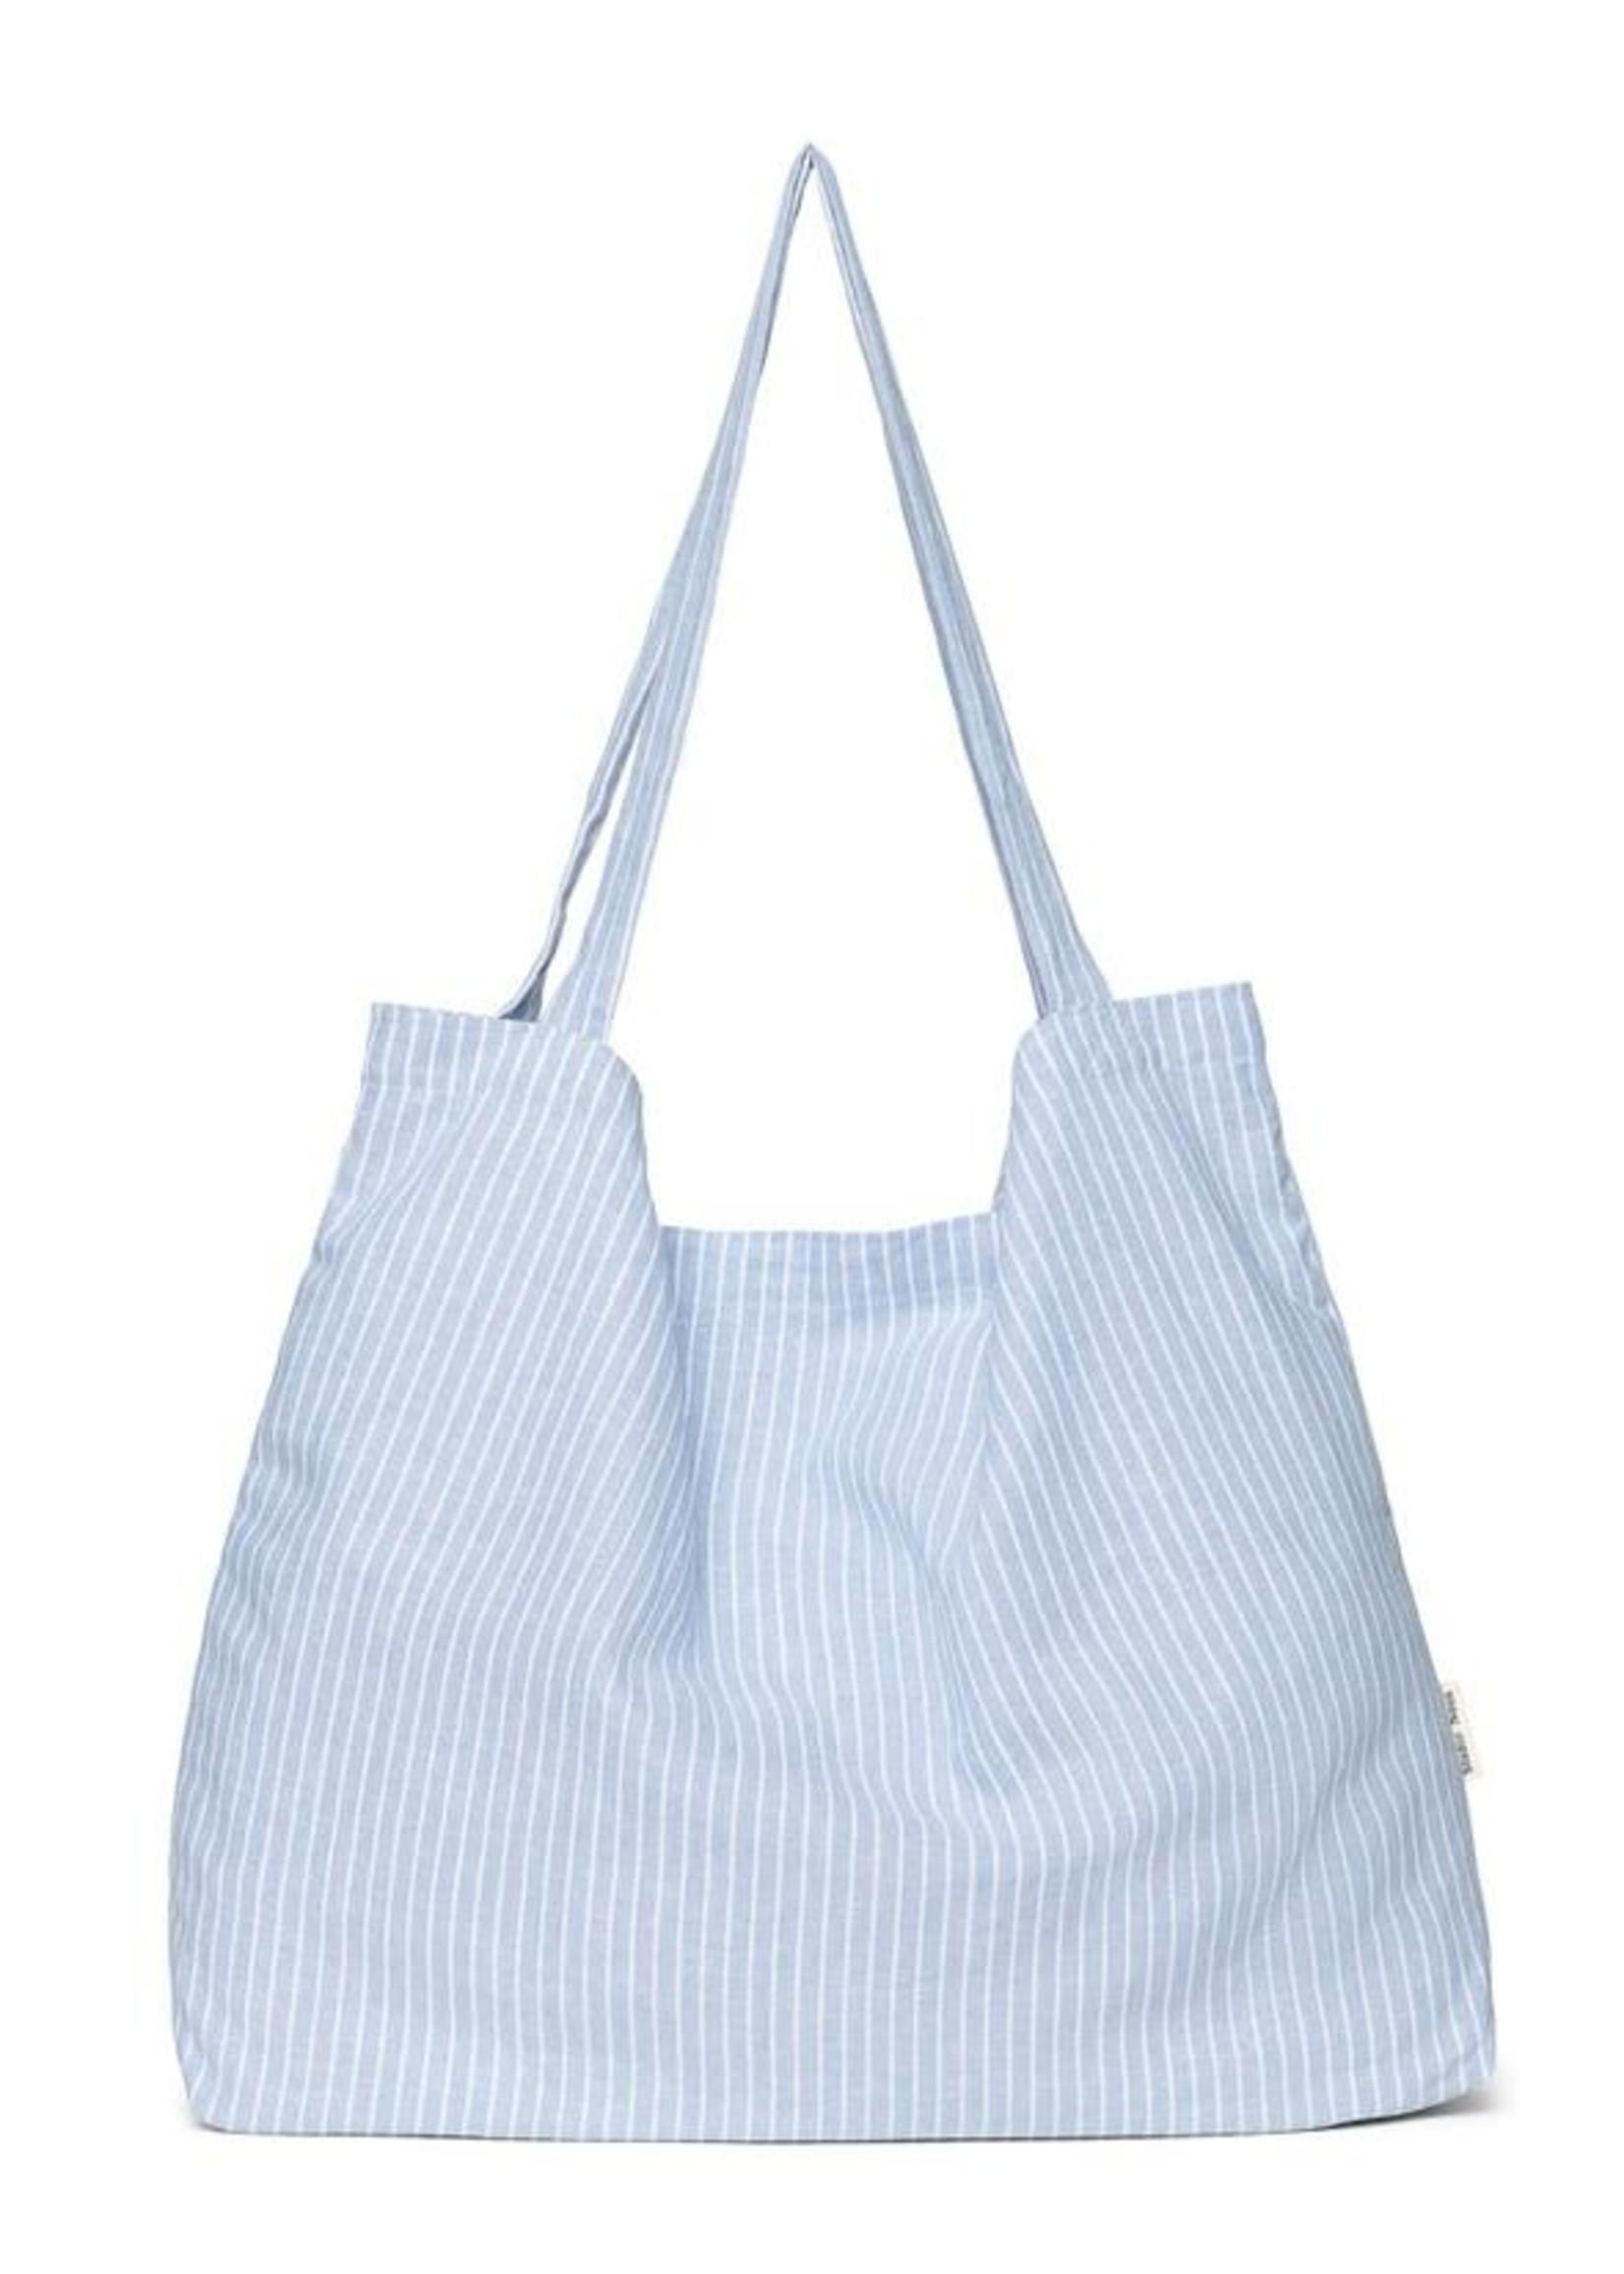 Studio Noos Mom Bag - Blue Striped Linen